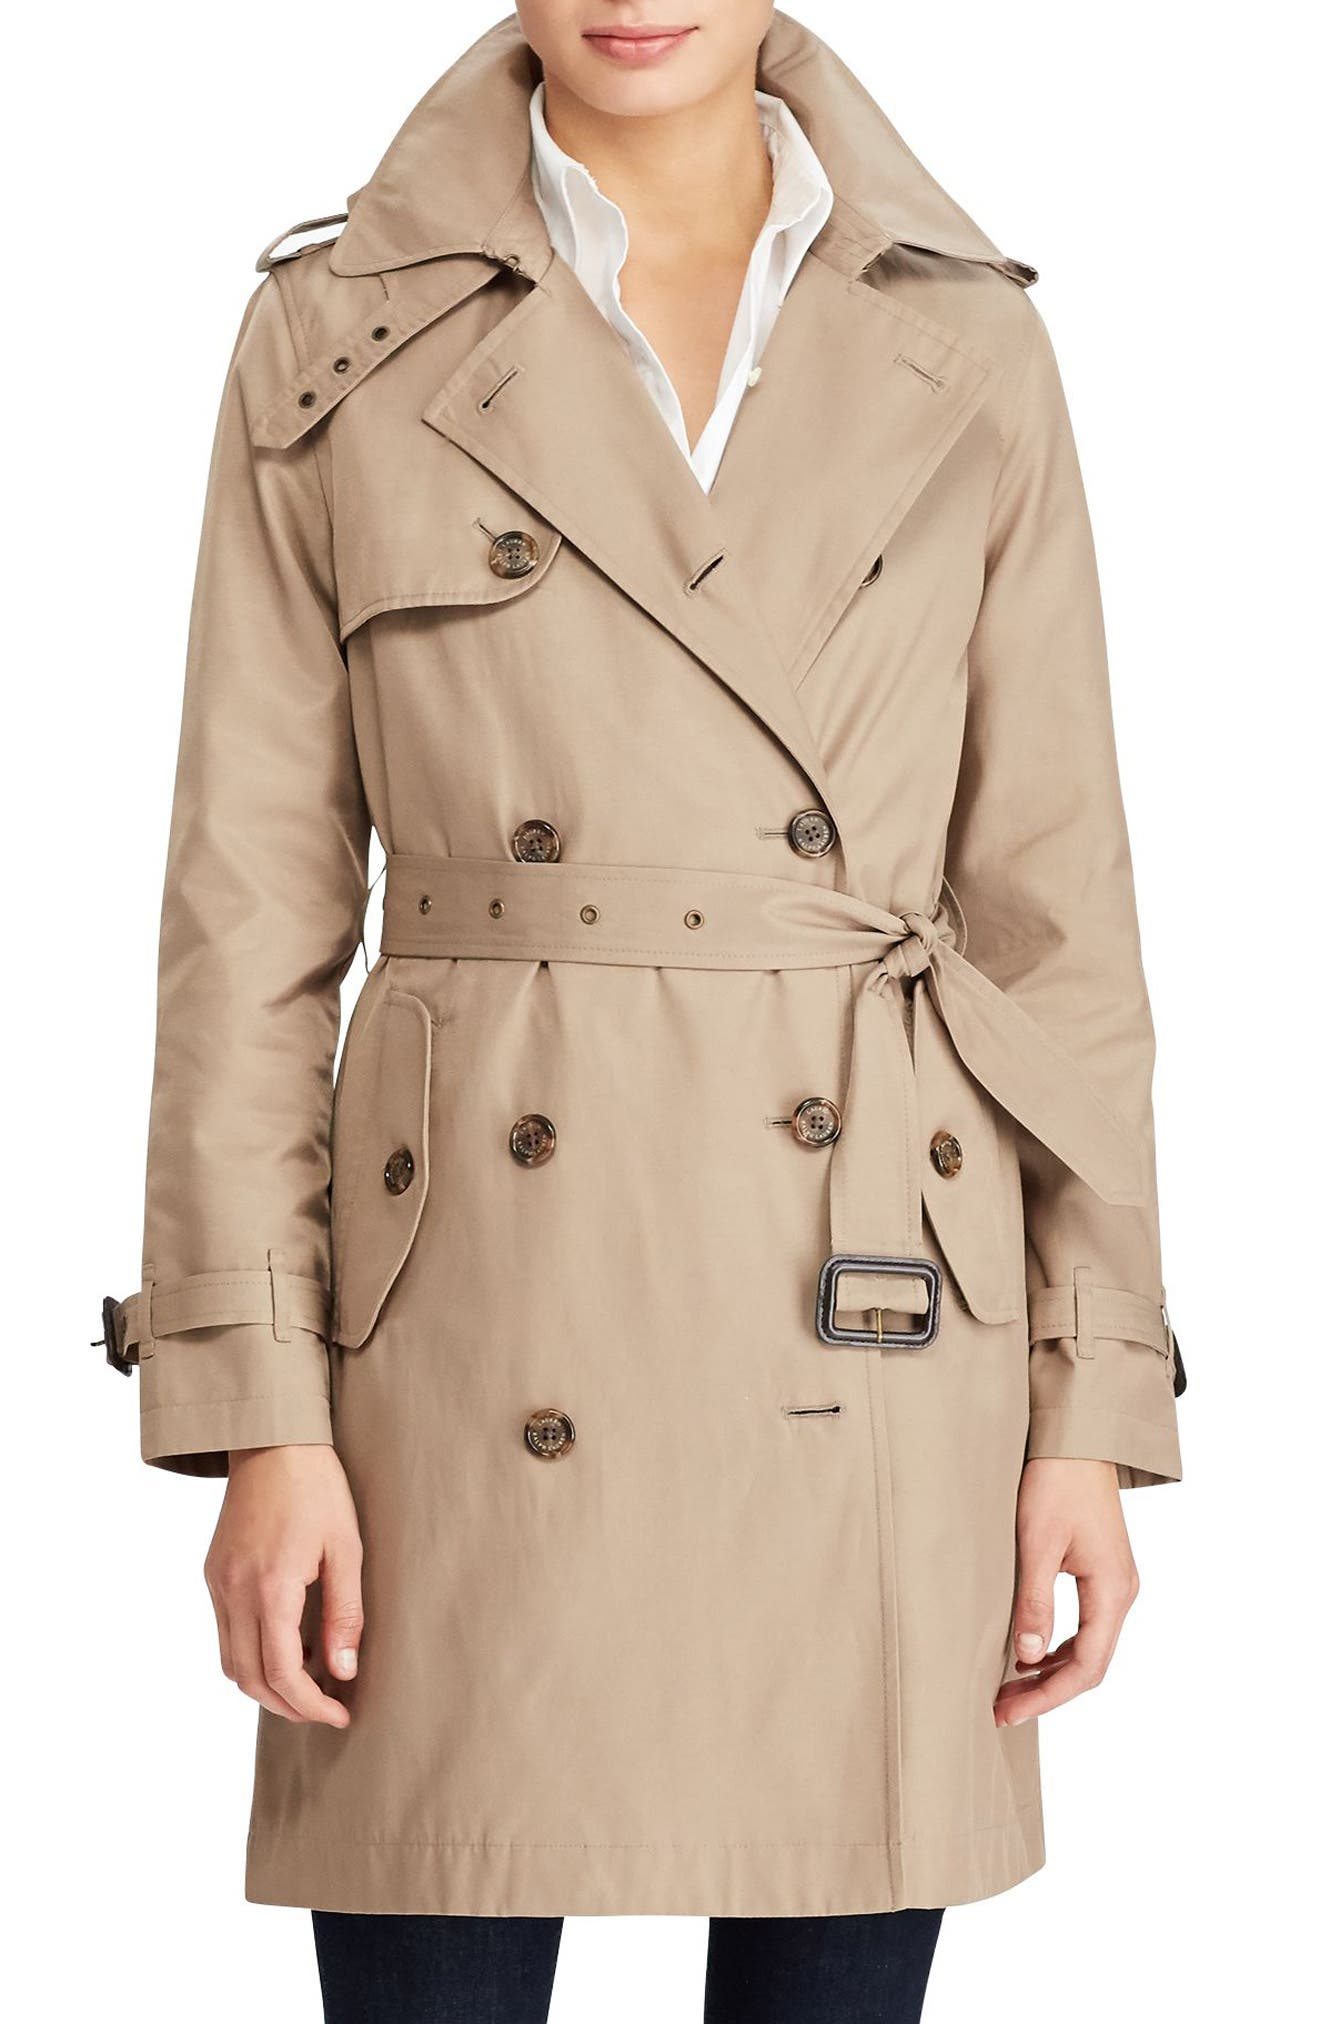 Cotton Blend A-Line Trench Coat,                         Main,                         color, Sand